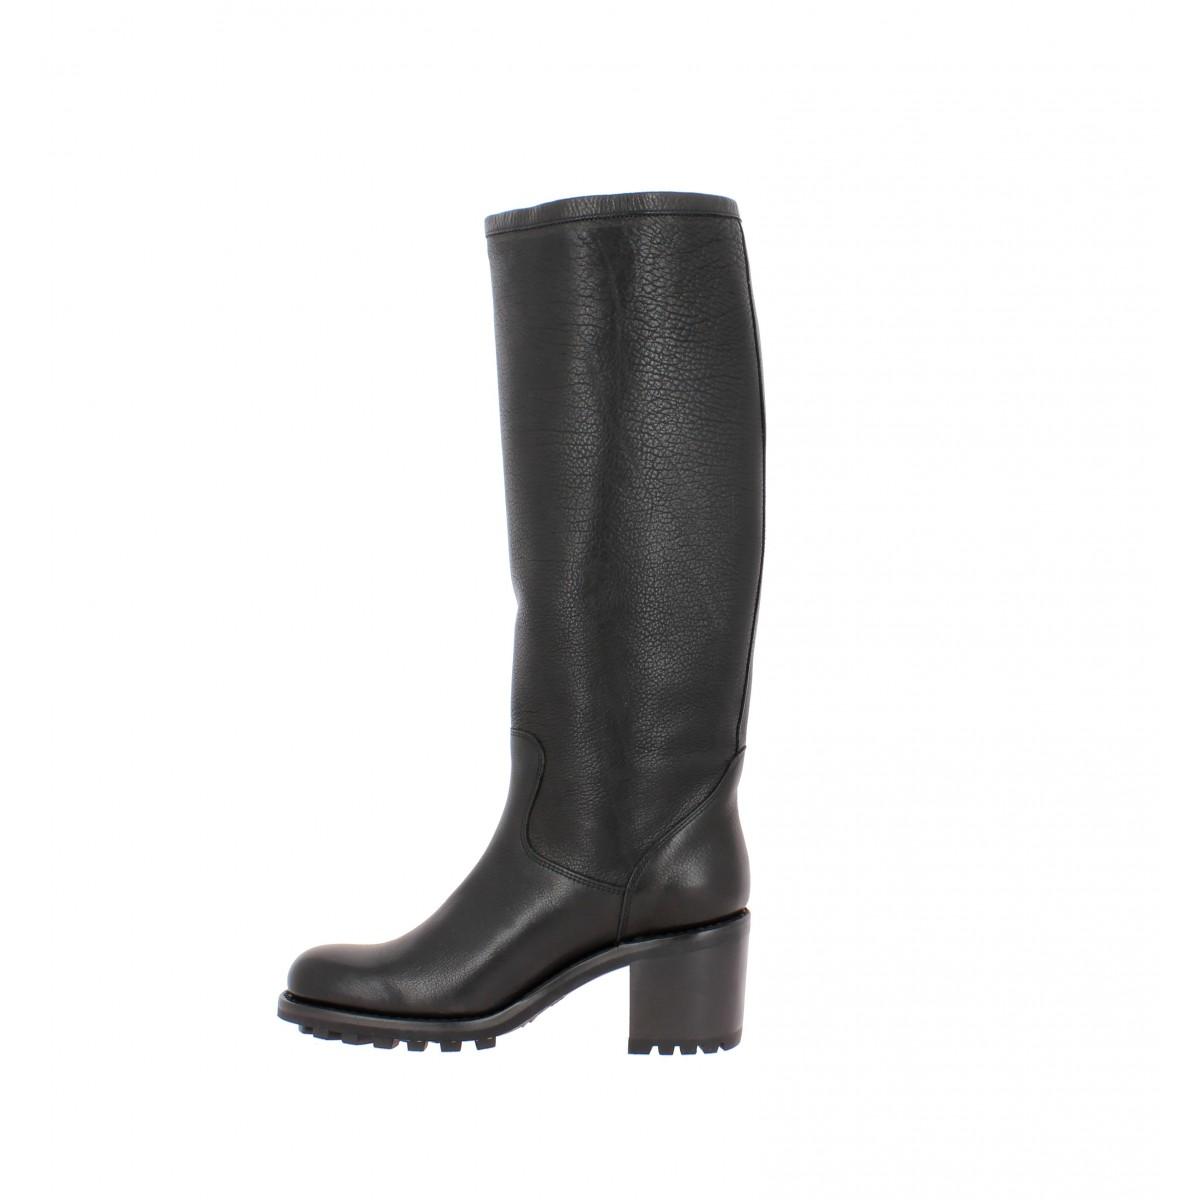 3ae4501da6df57 Free lance biker 7 geronimo cuir femme noir   Fanny chaussures